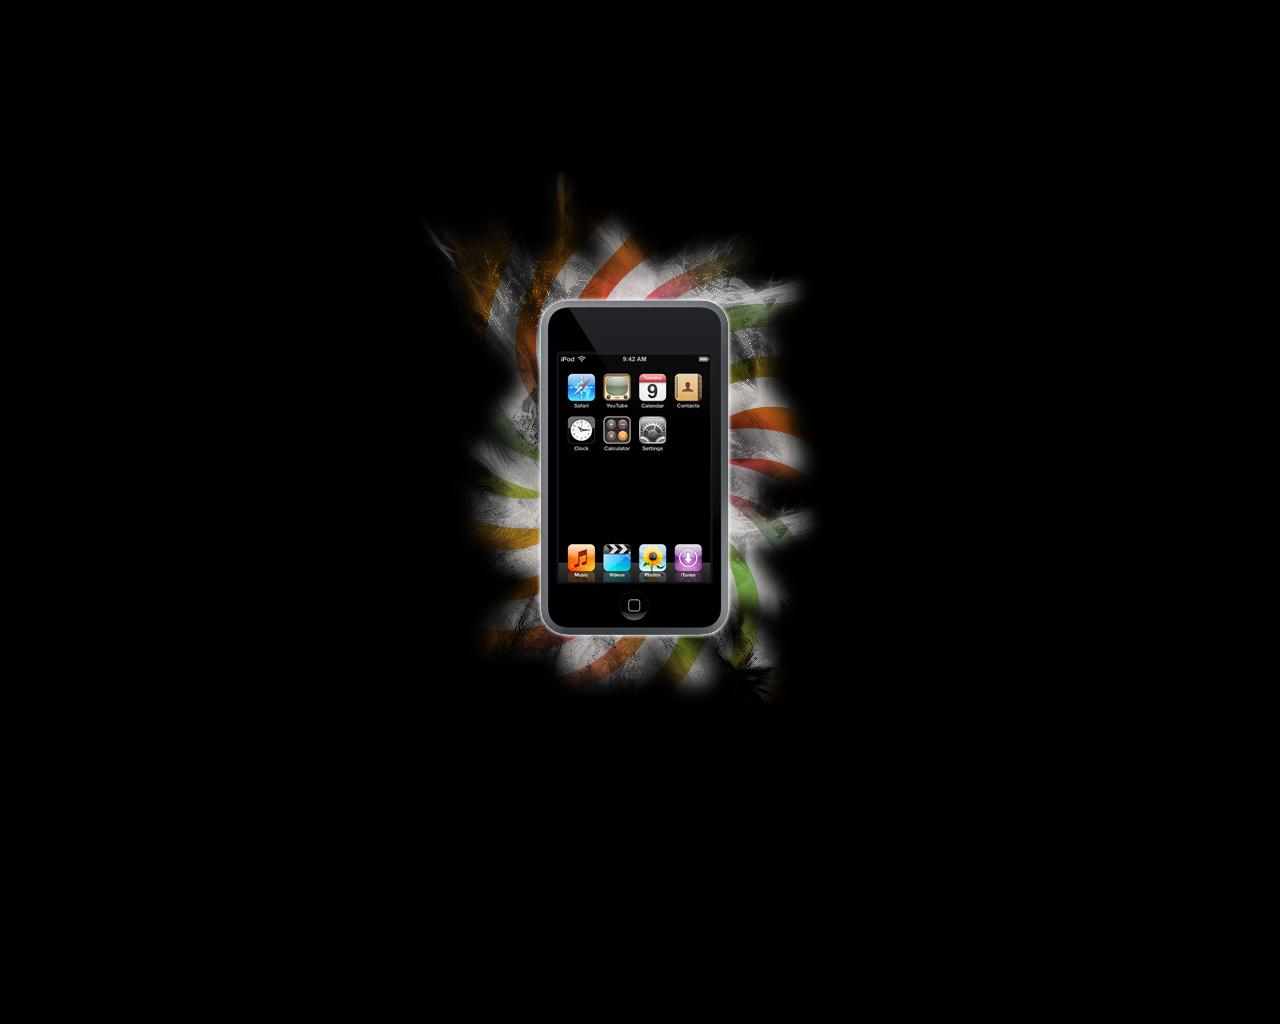 http://3.bp.blogspot.com/-RzJrjKxLuJ8/TdK4V0XUa4I/AAAAAAAAAsE/0Azxu2tHv3A/s1600/ipod+touch.jpg